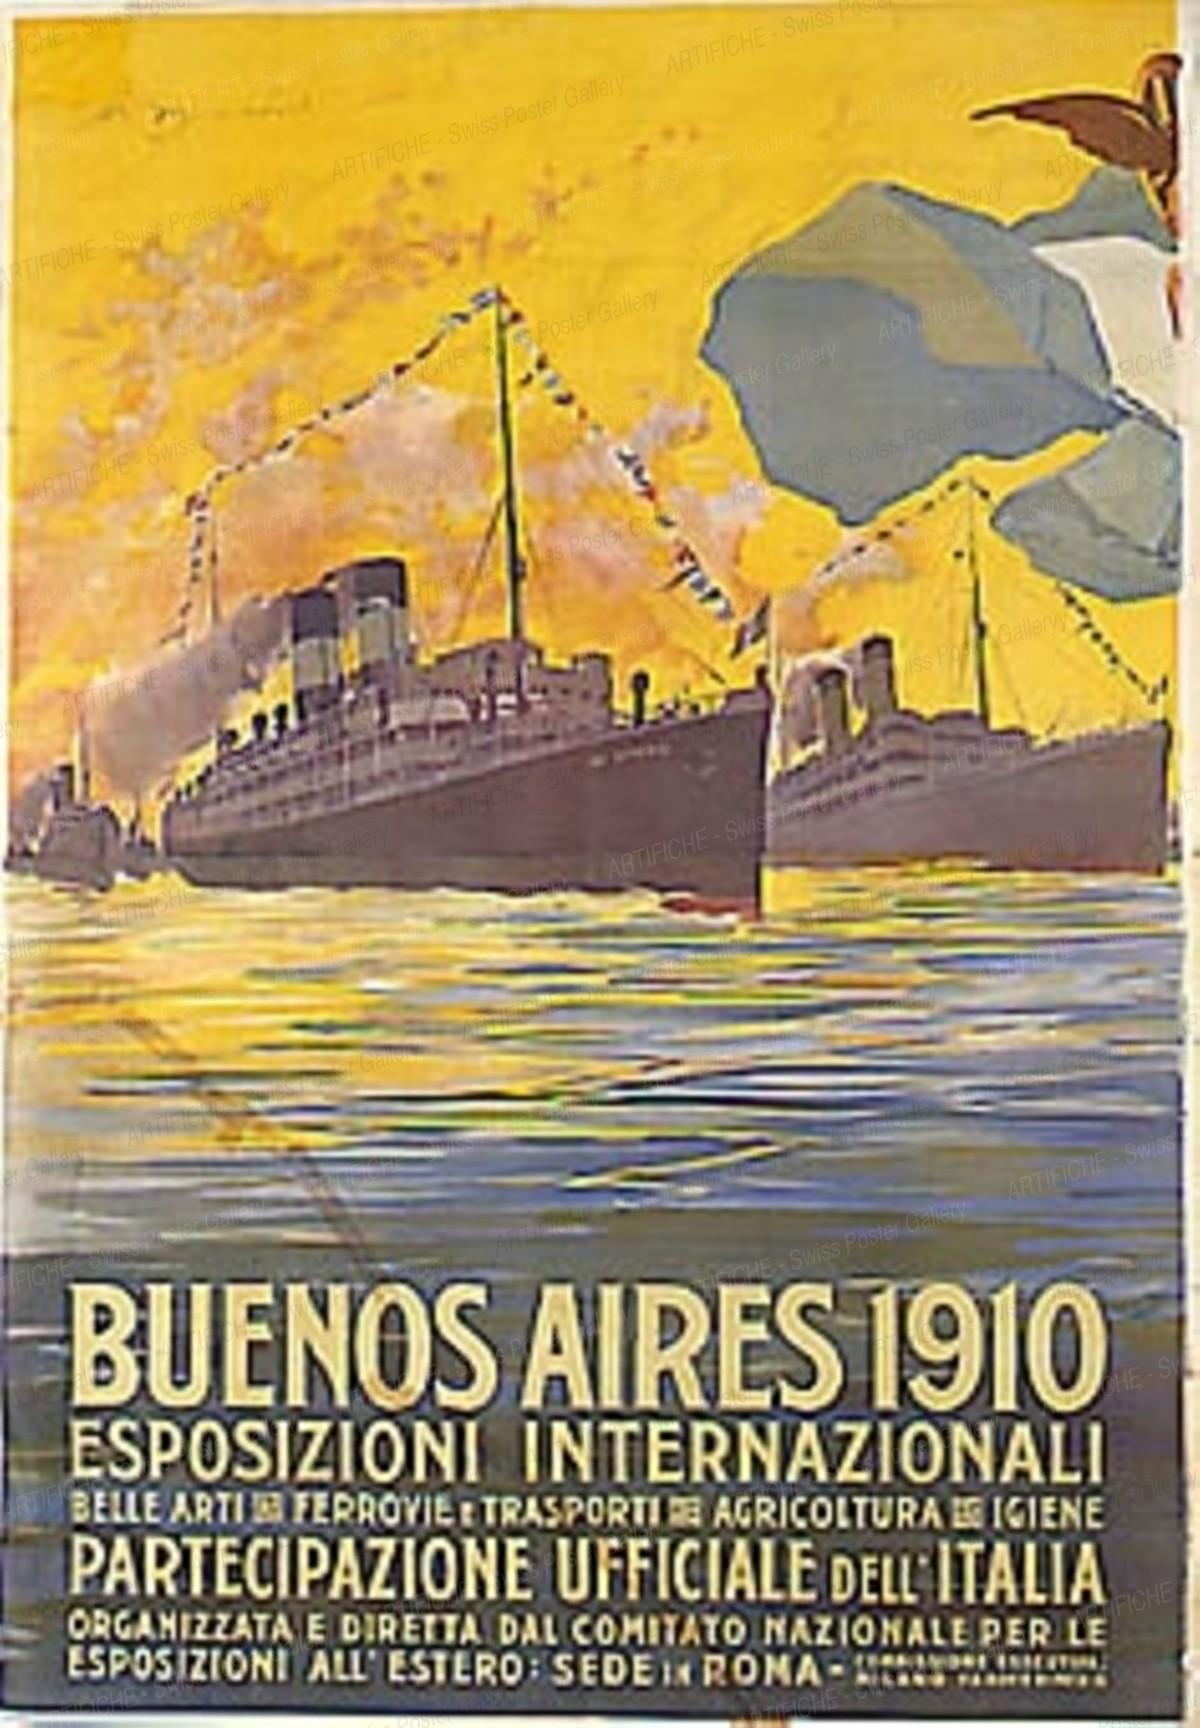 Buenos Aires – 1910 – Esposizioni Internat., Artist unknown